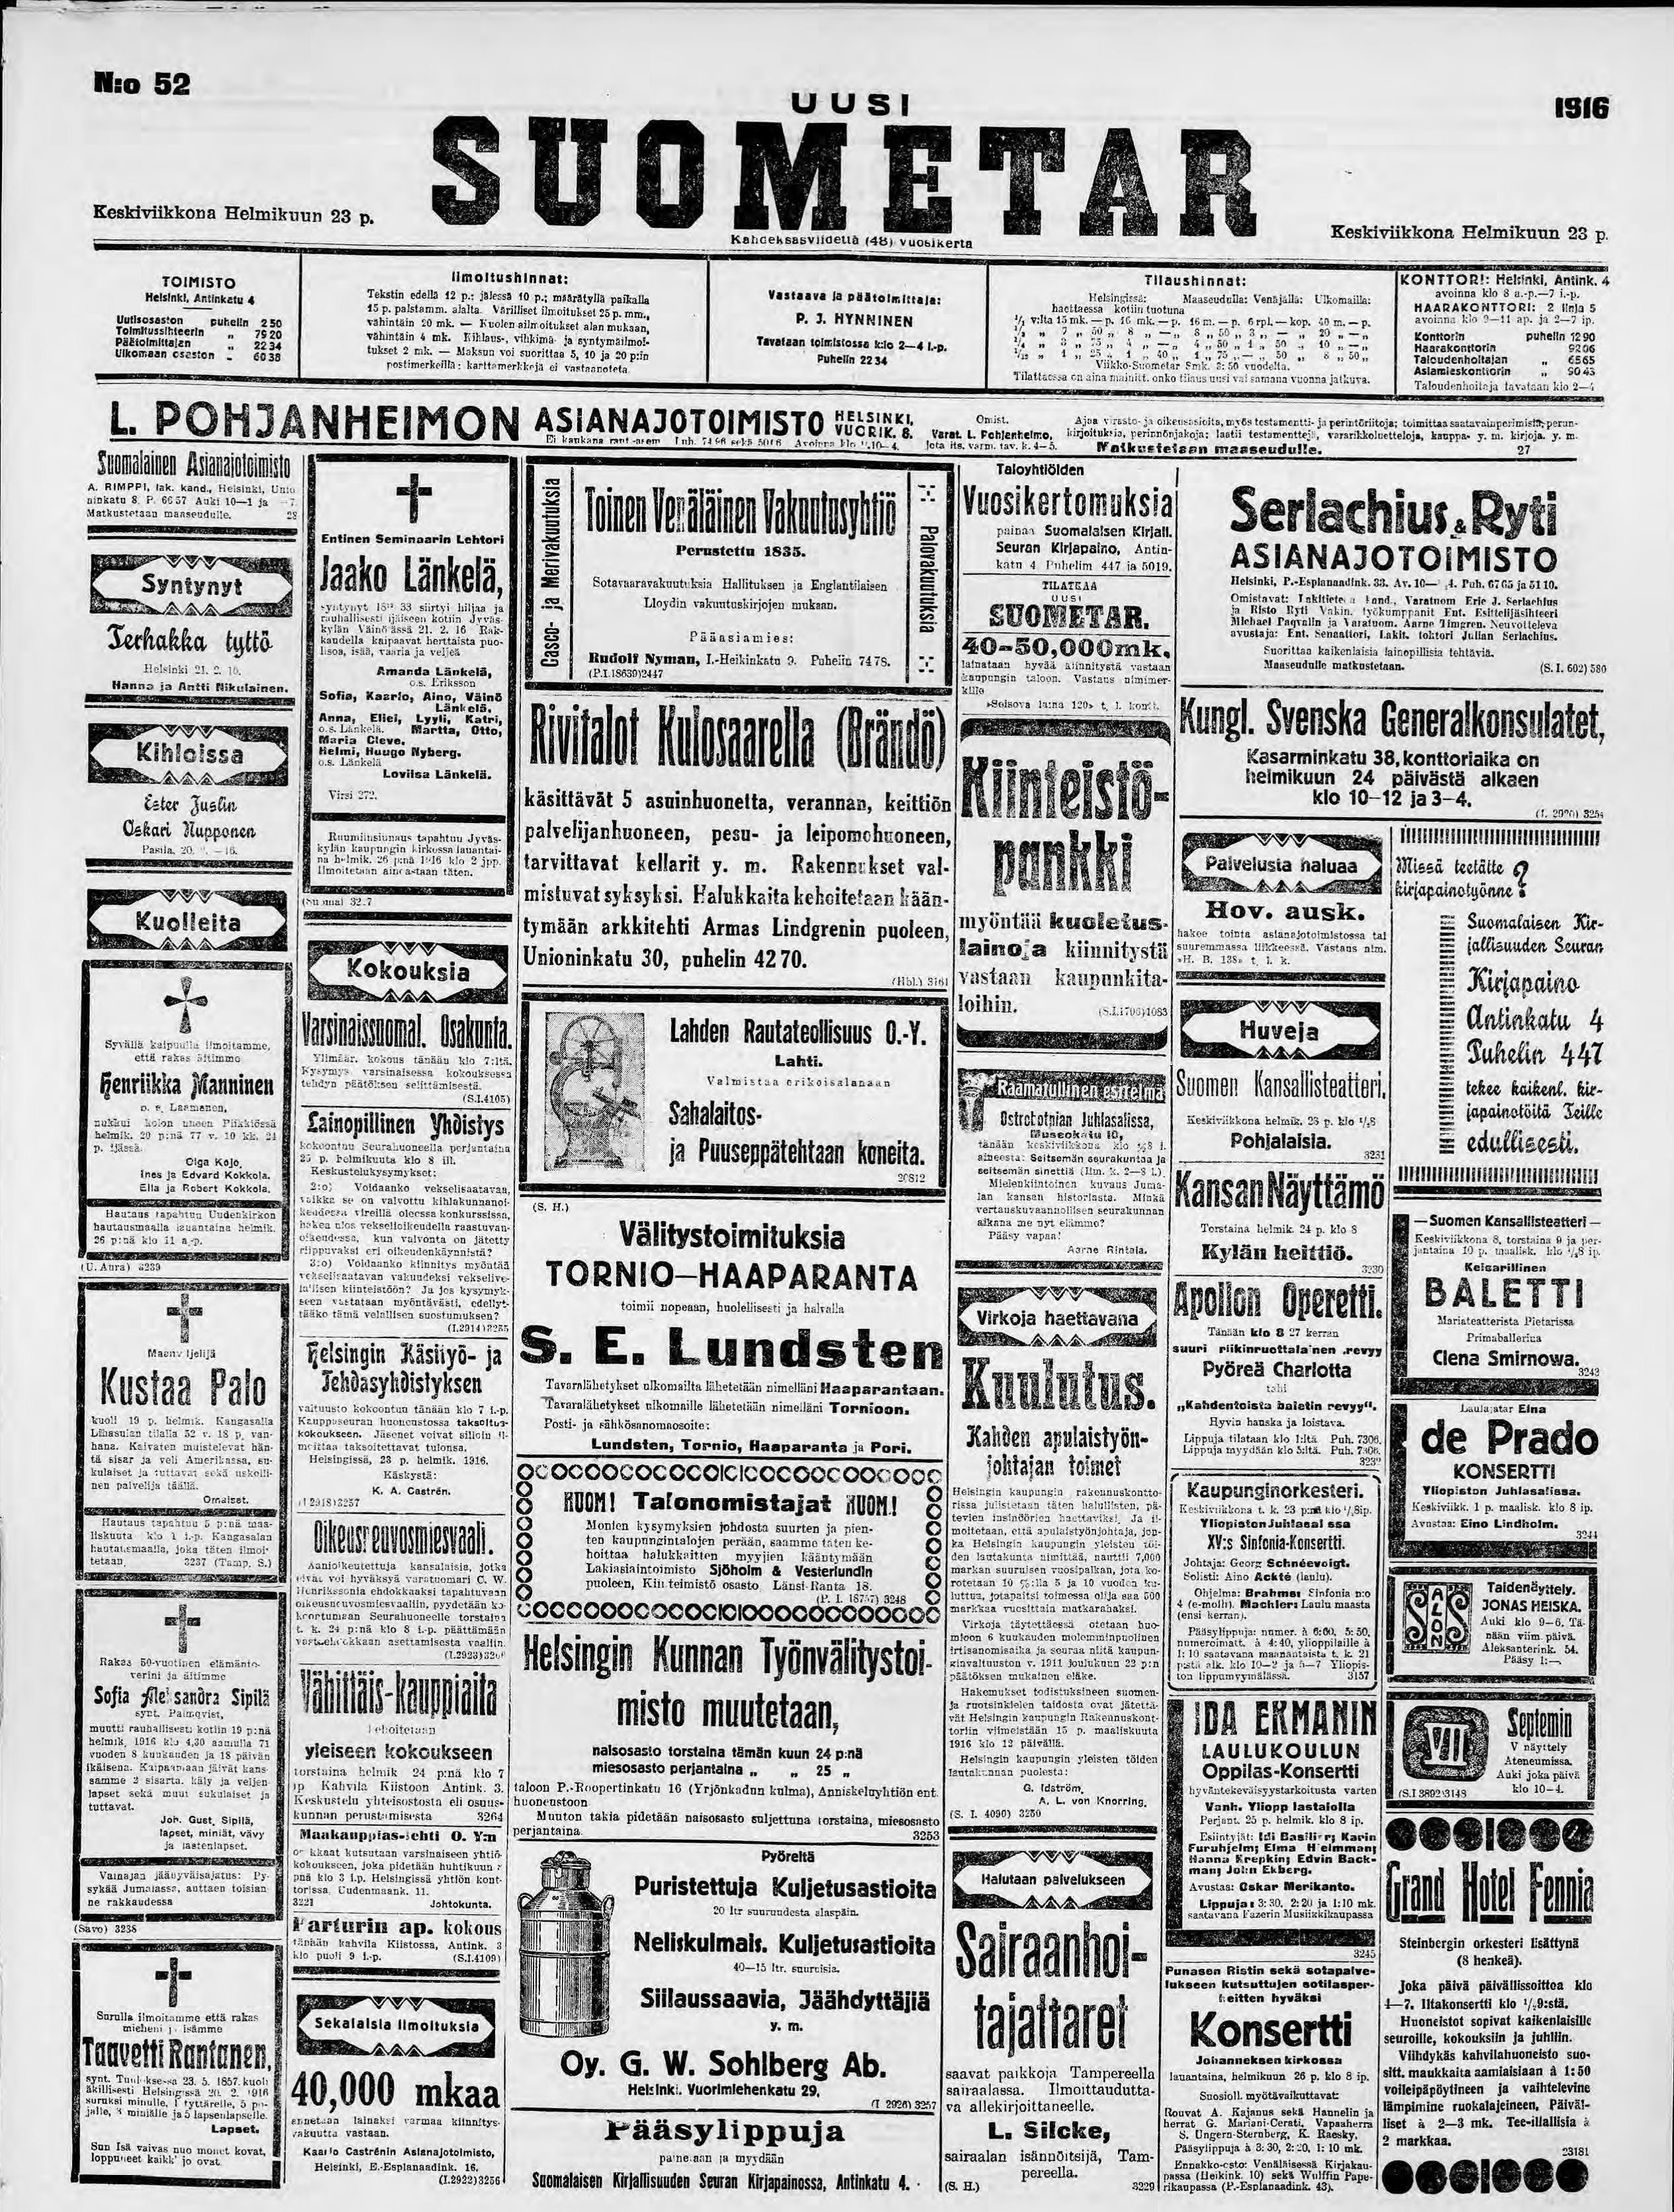 Uusi_Suometar_23.2.1916